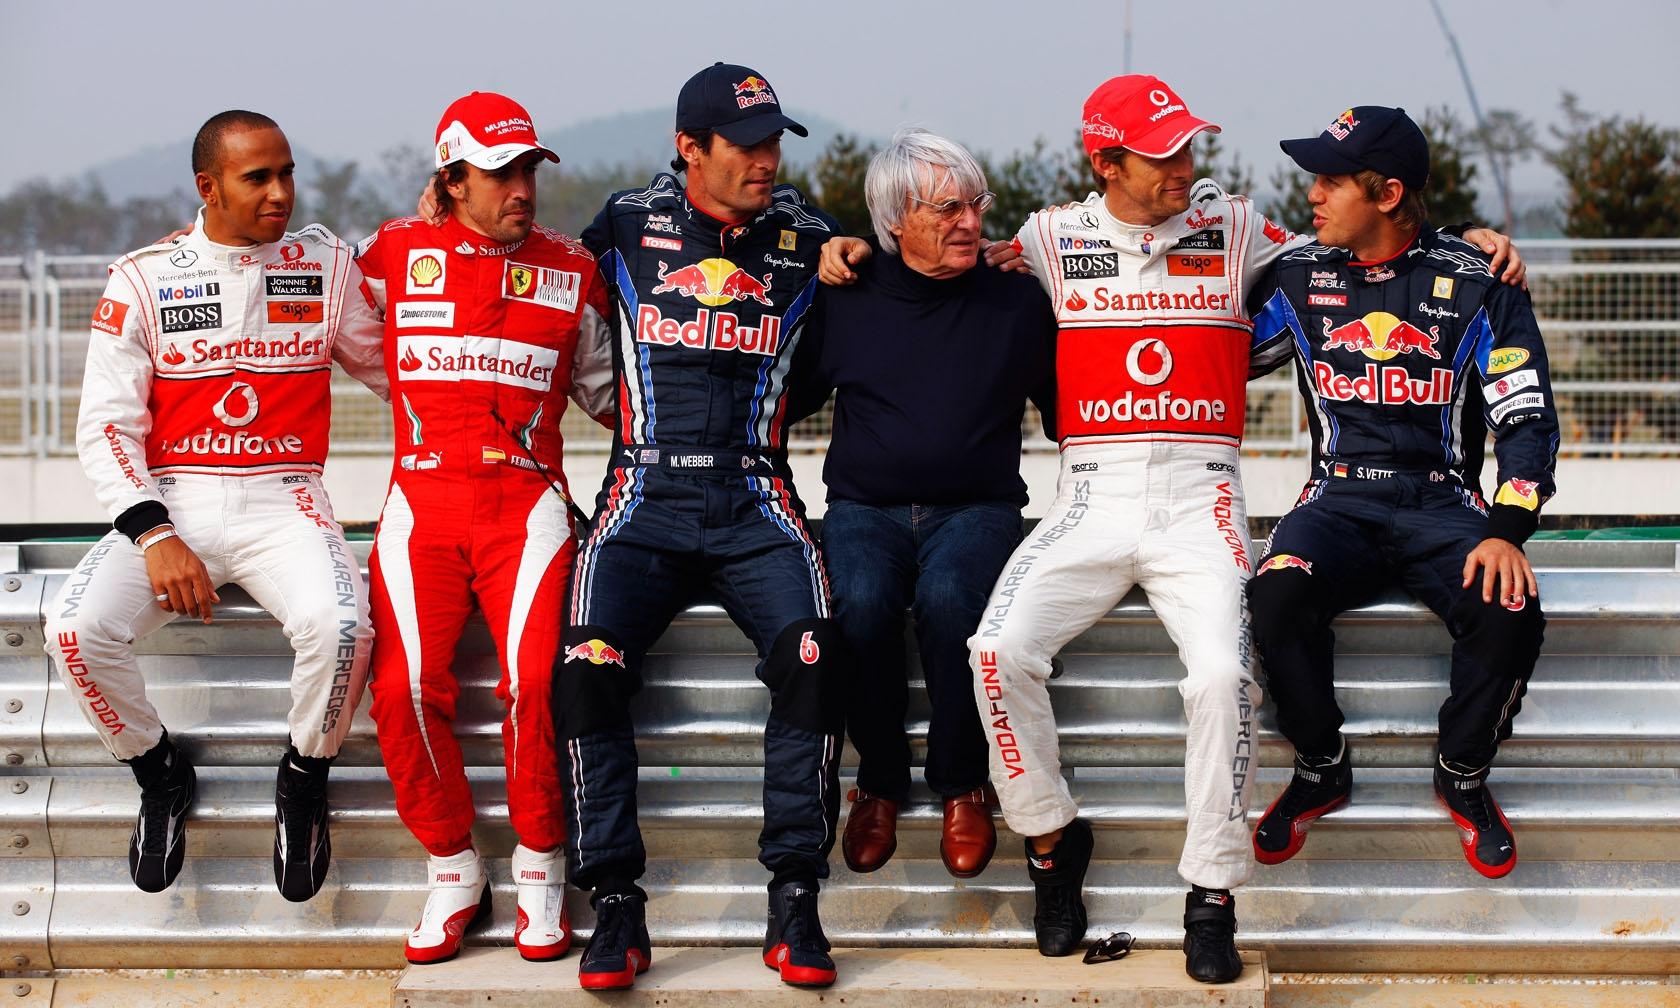 Bernie-Ecclestone-1.jpeg